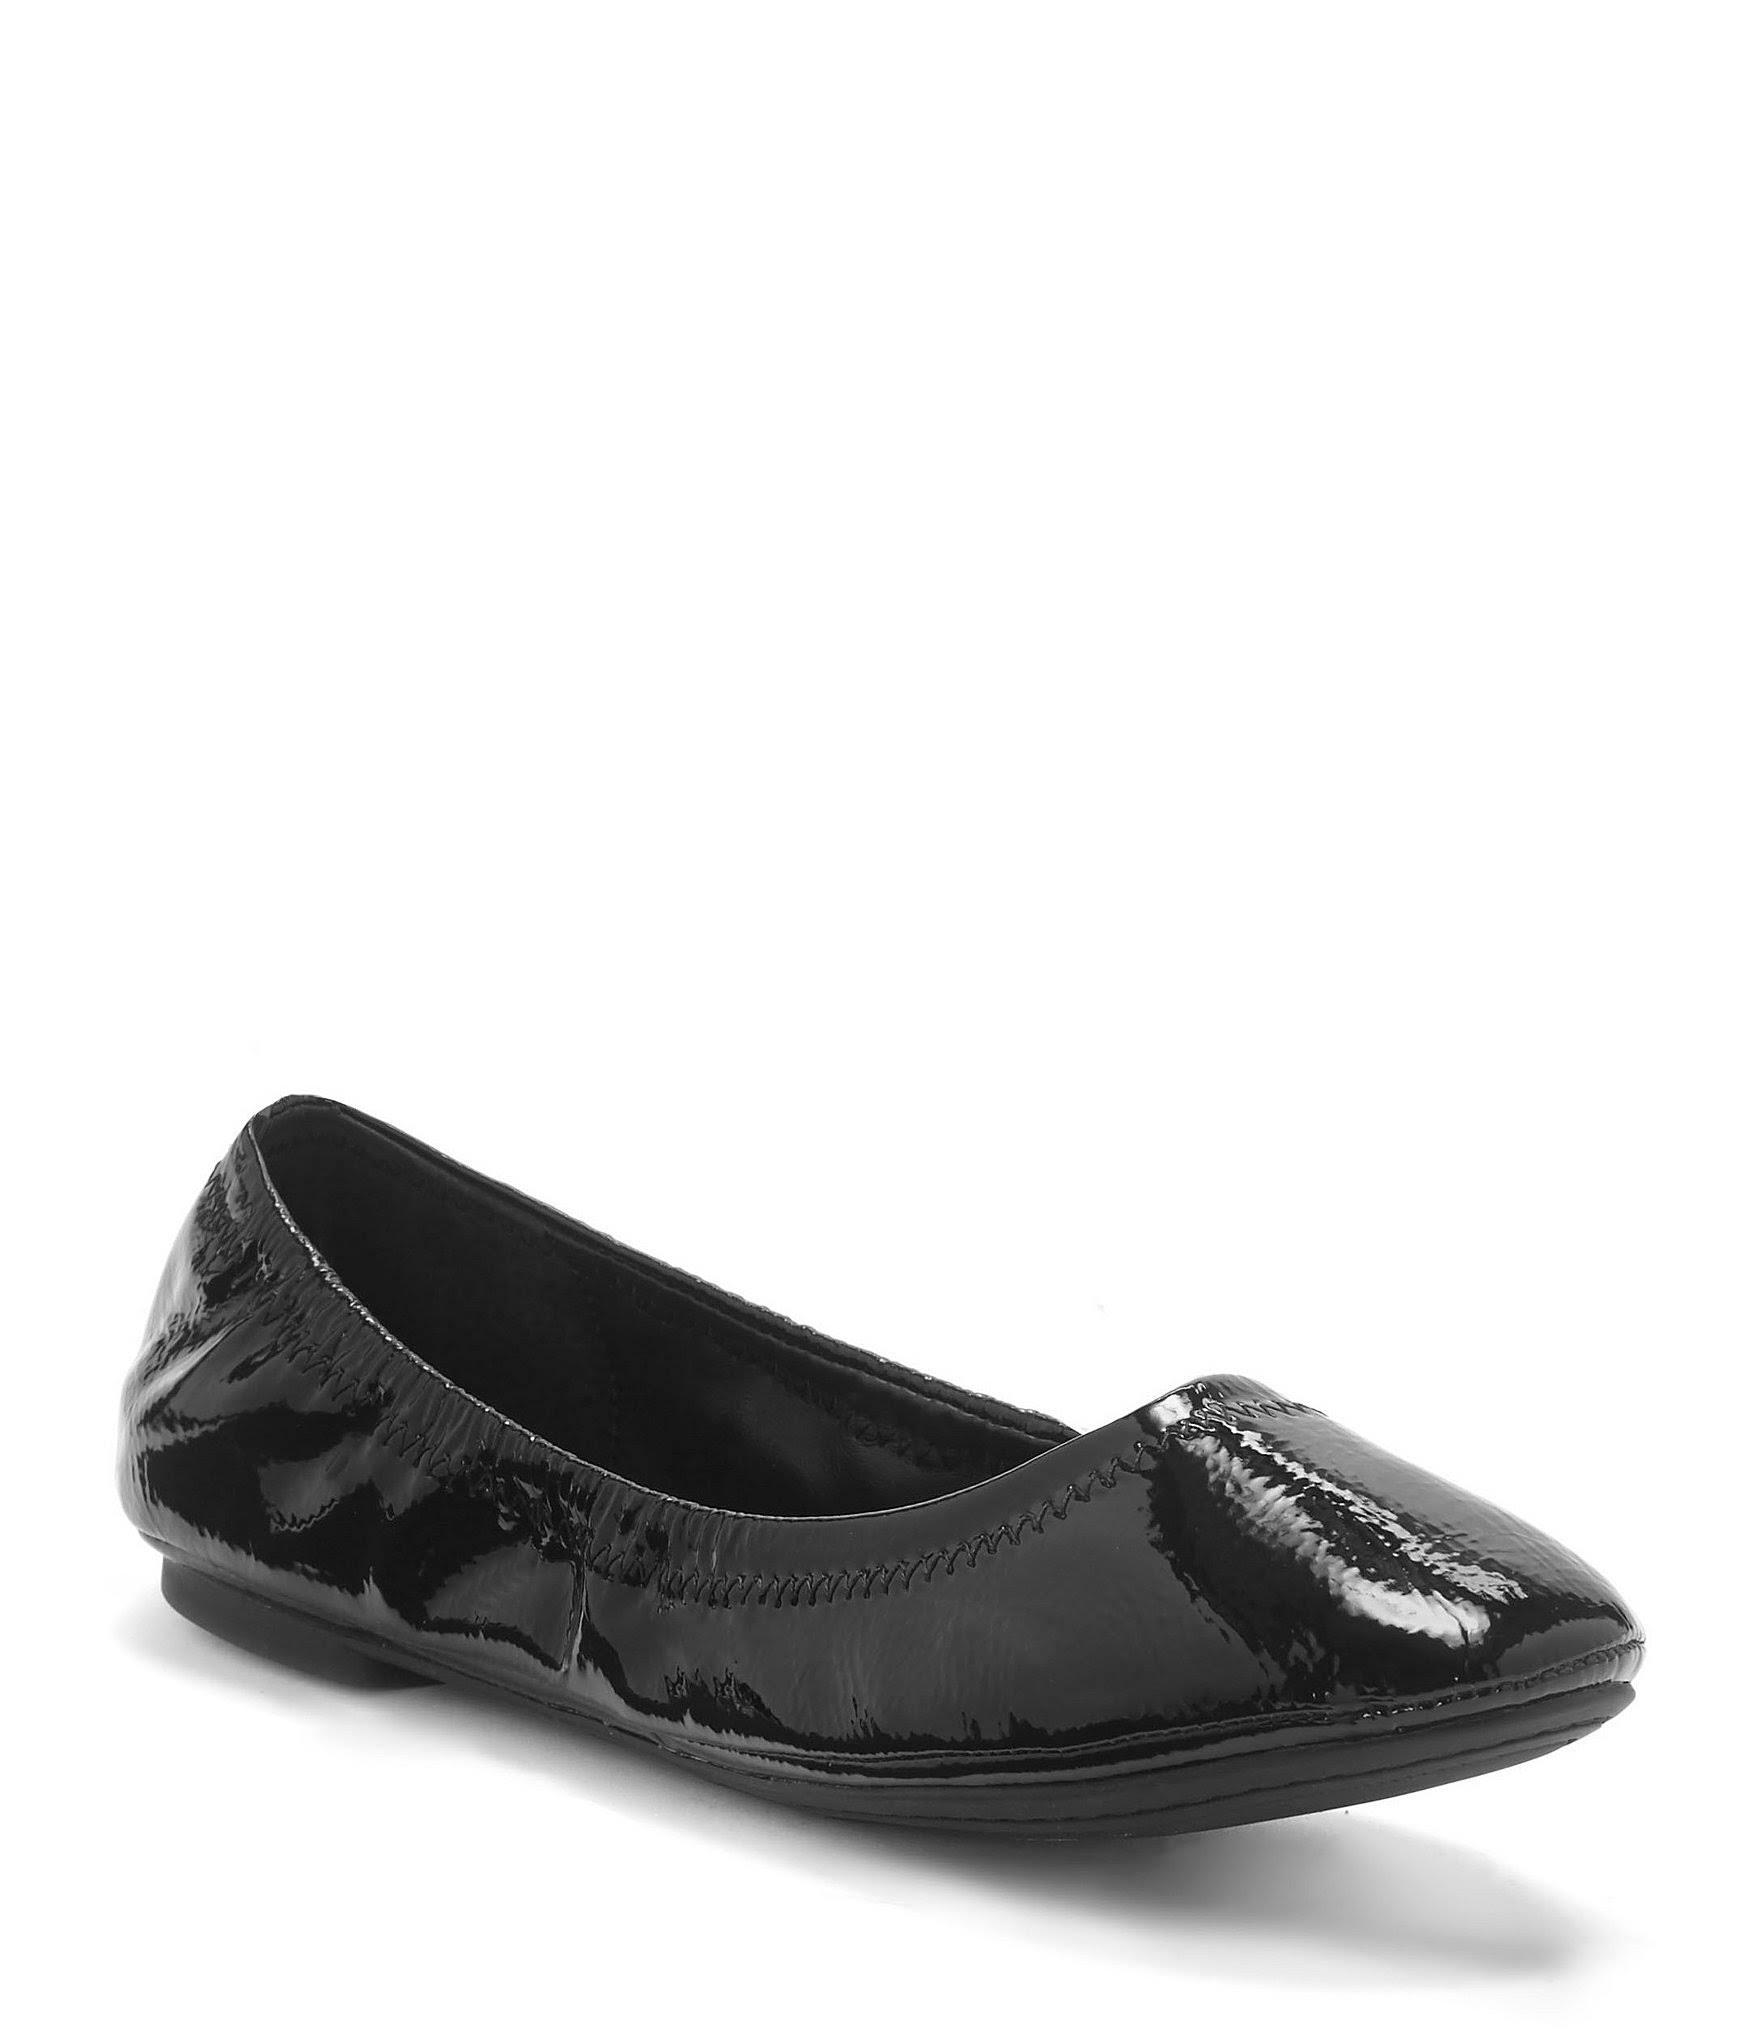 Lucky Brand FlatBrevetto Ballet Nero Emmie jAq4R53L